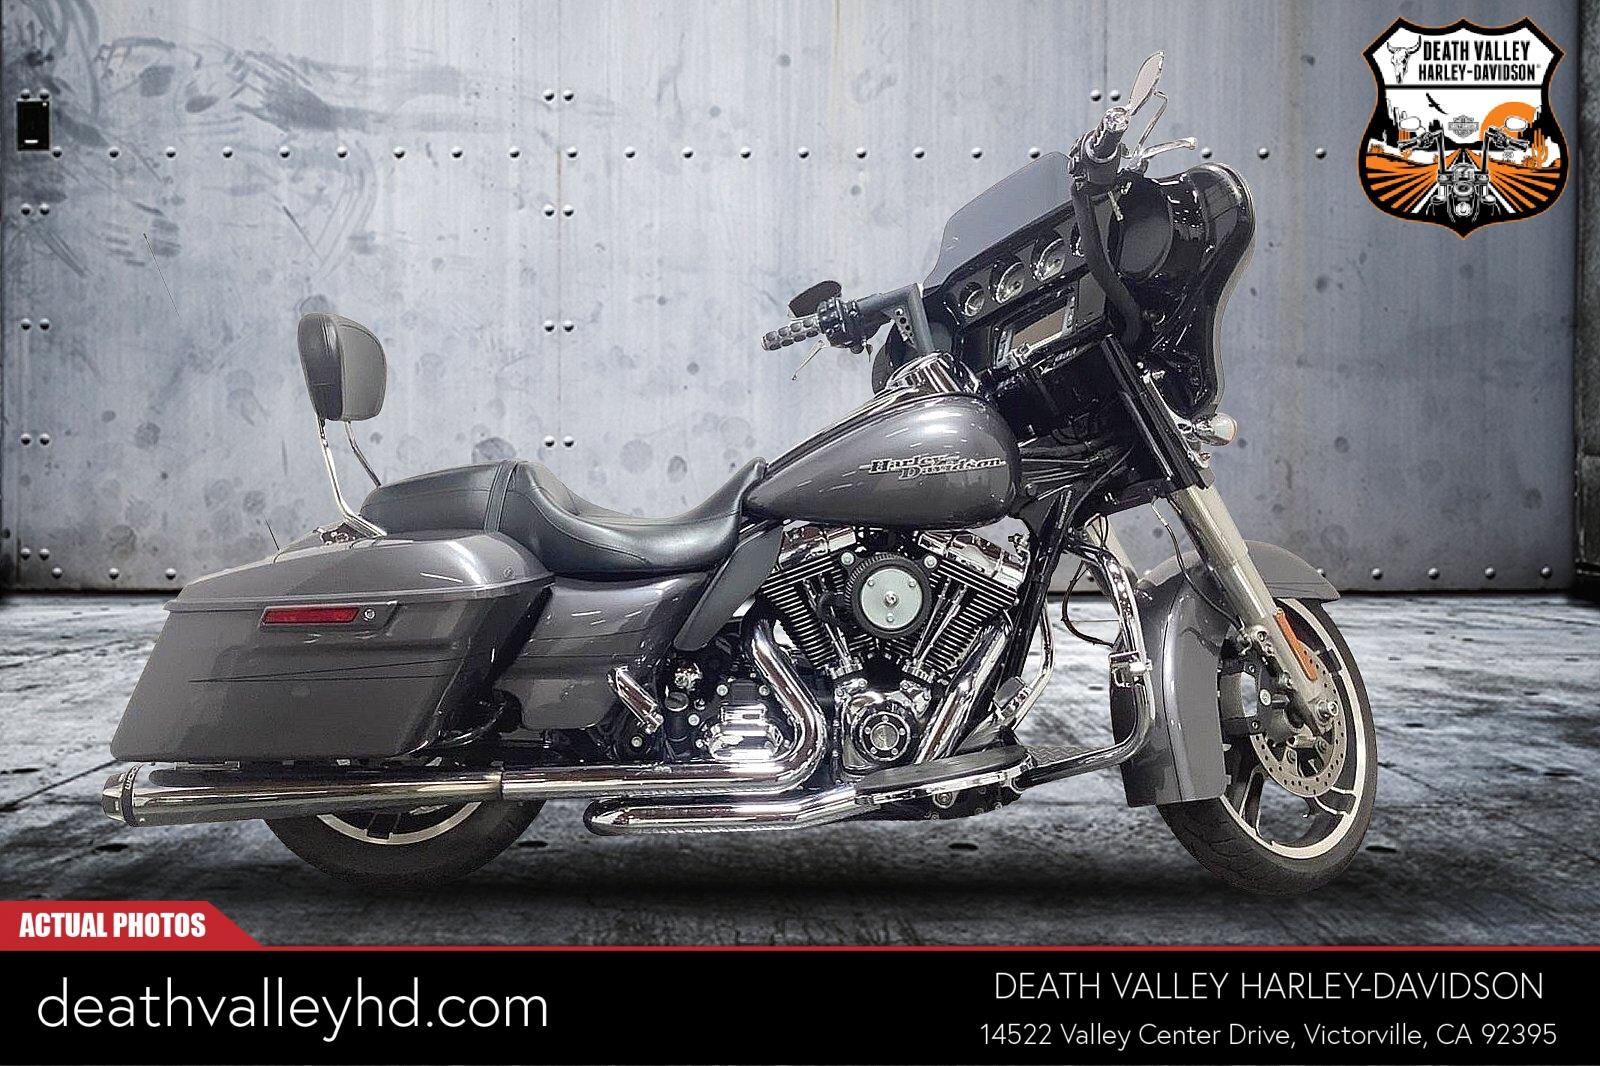 2015 Harley-Davidson Street Glide Special [7]